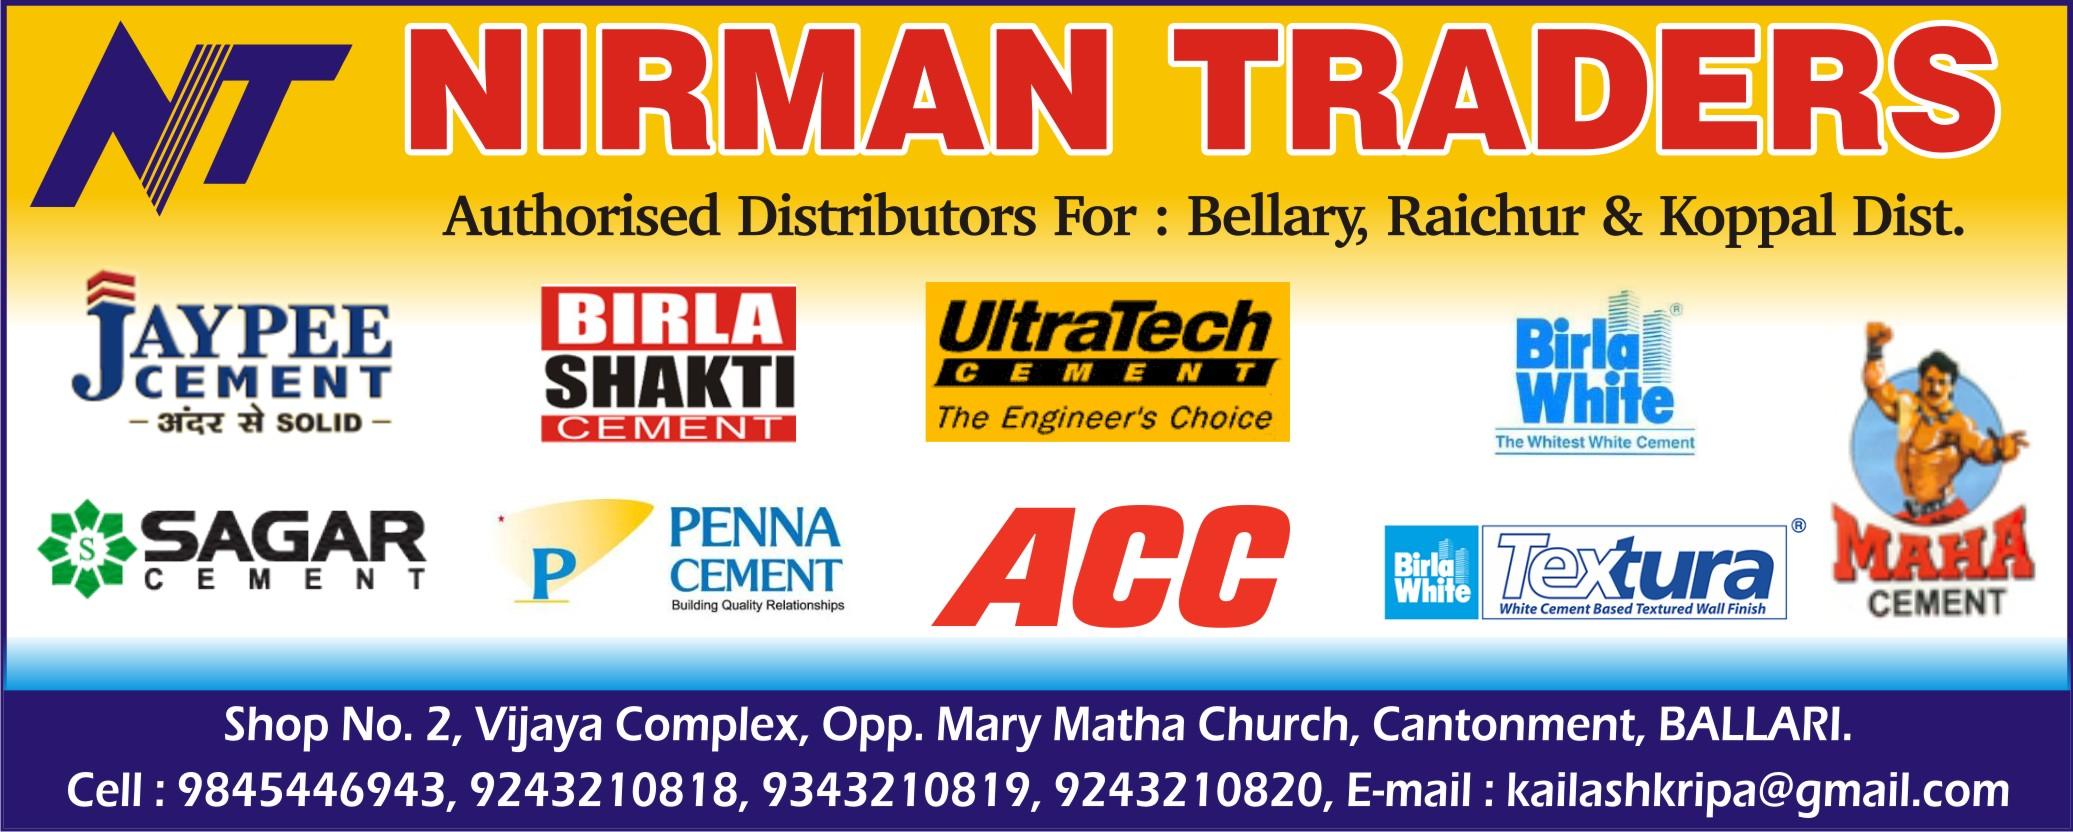 Nirman Traders